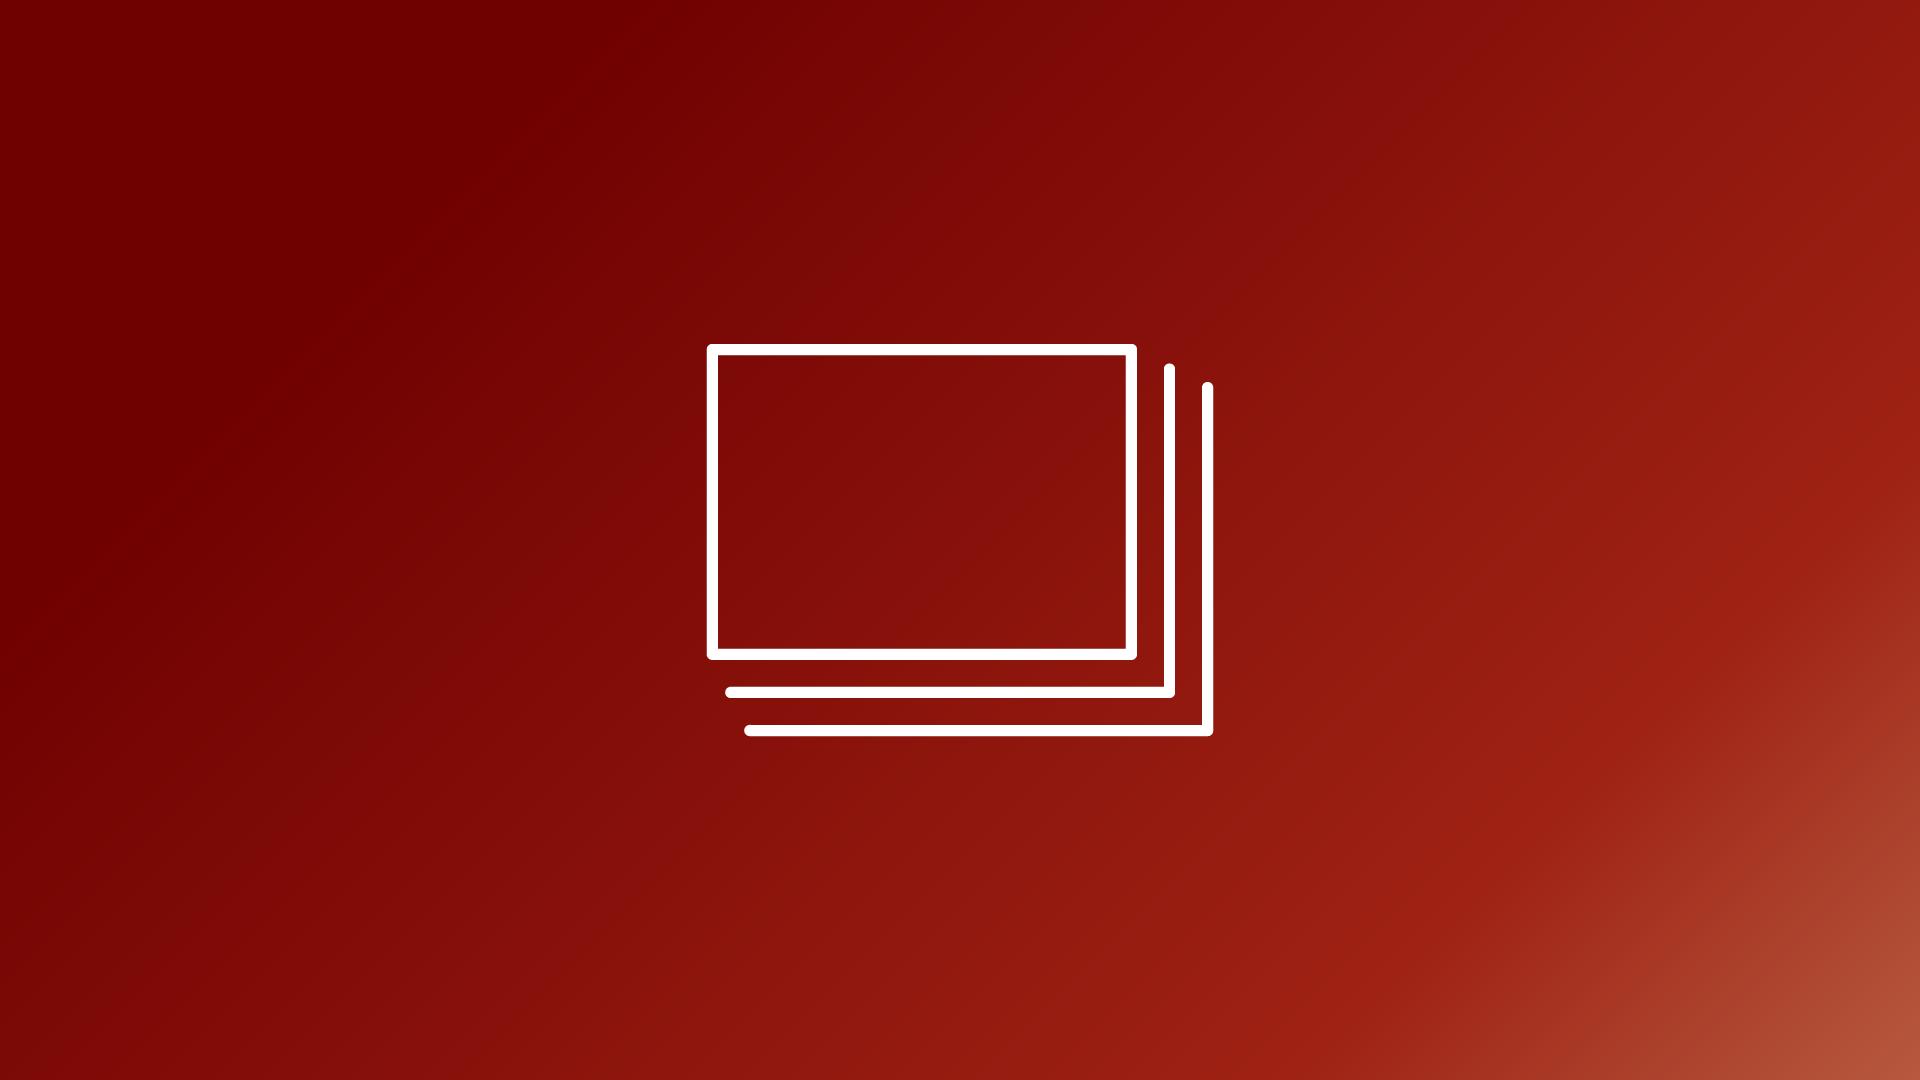 staroffice impress 7 intro training atomic learning Microsoft Office Clip Art Gallery microsoft windows clip art gallery bread bowl